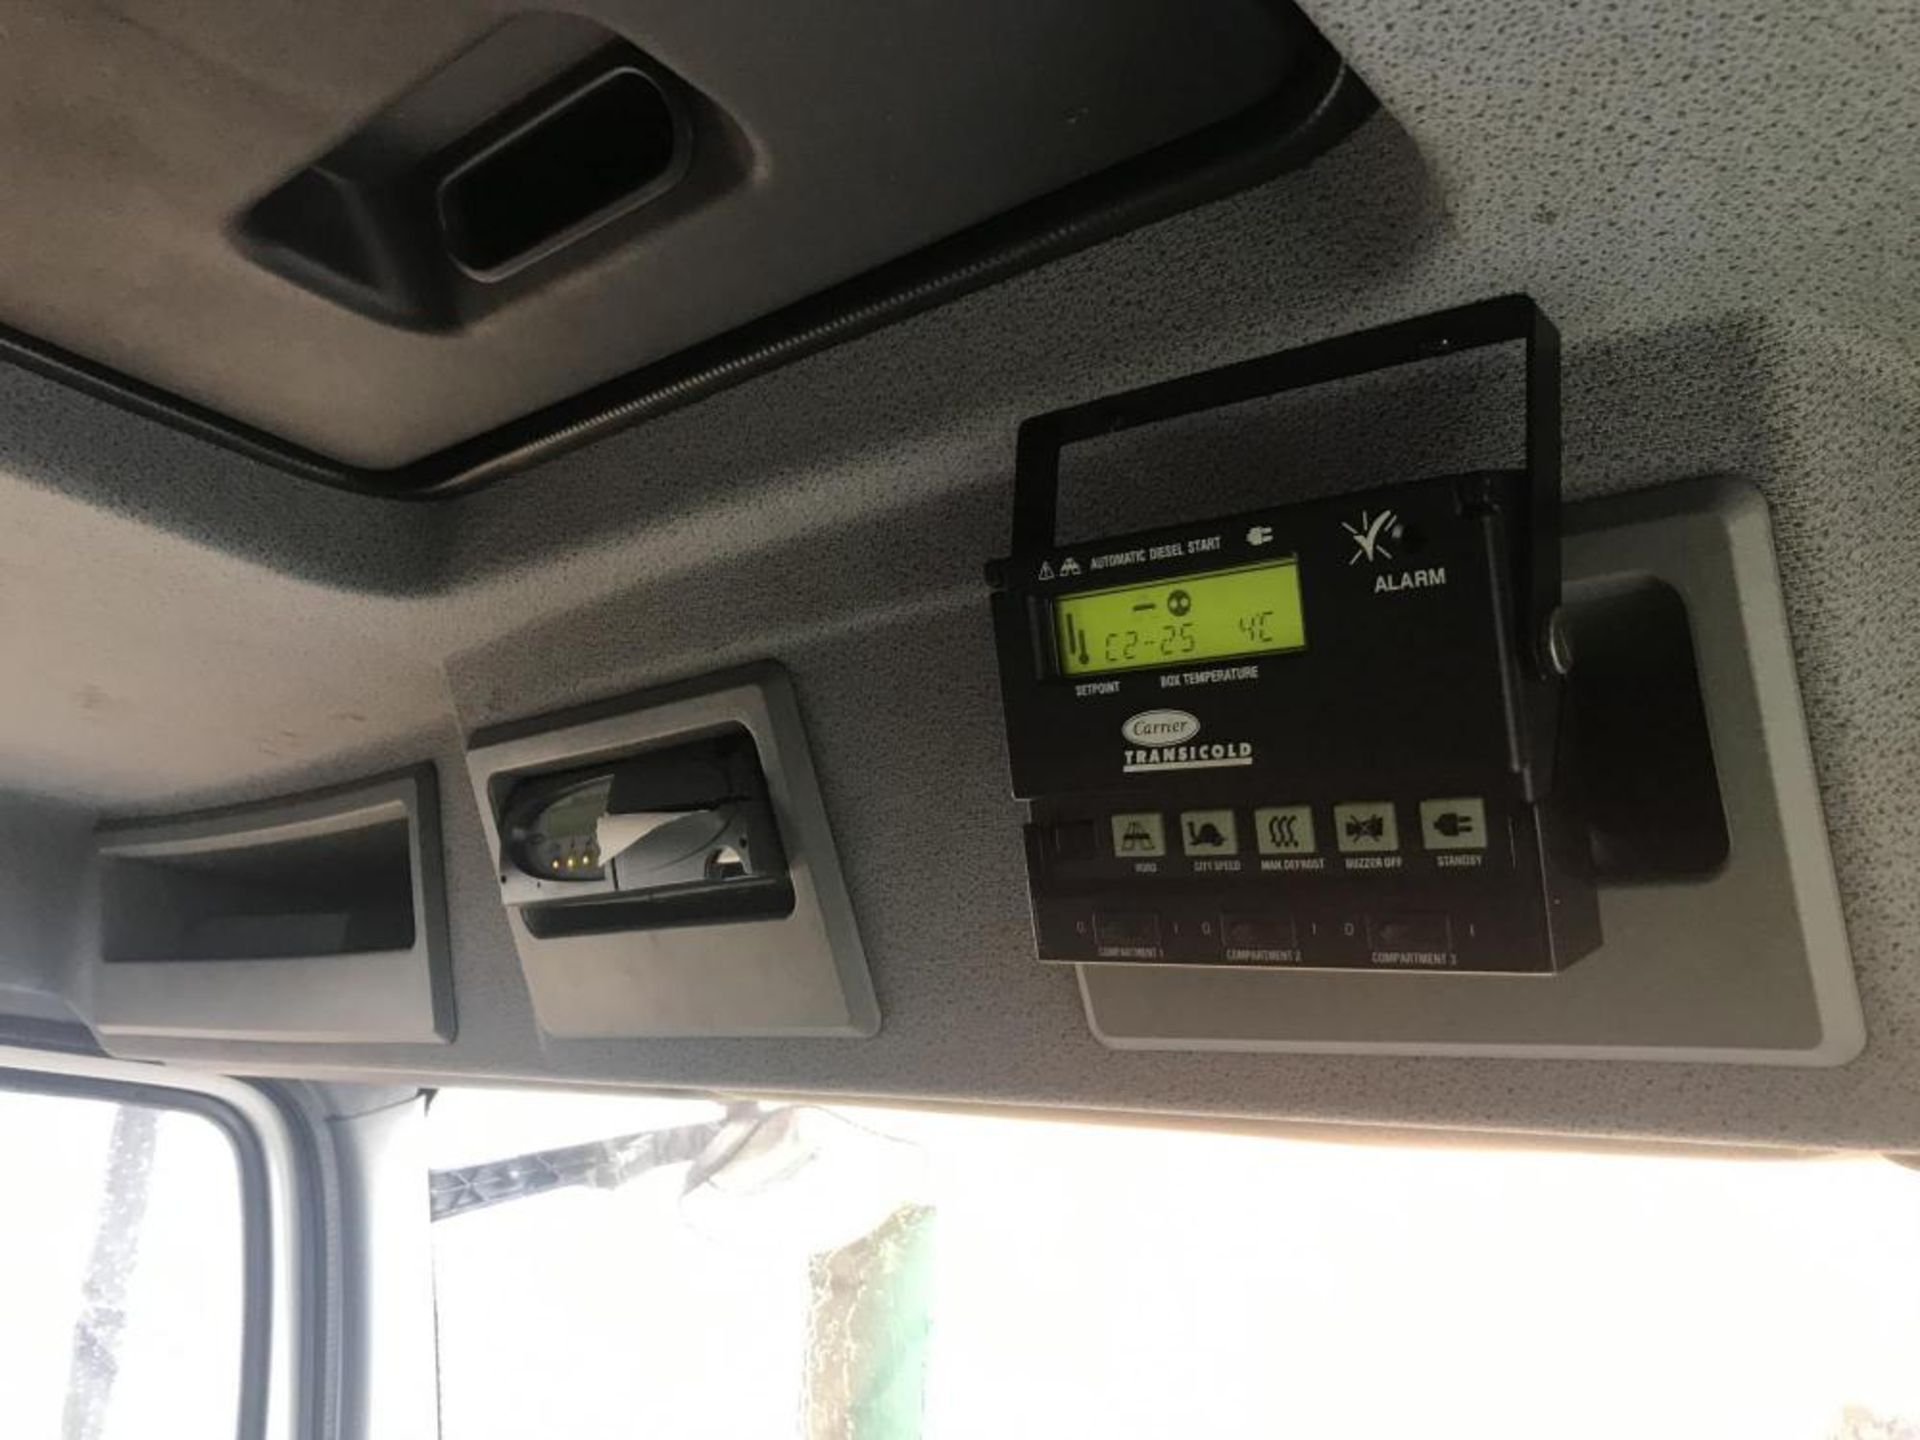 2013/63 REG MERCEDES-BENZ AXOR ATEGO 1824L DAY WHITE FRIDGE BOX TAIL LIFT AIR SUSPENSION *PLUS VAT* - Image 10 of 21